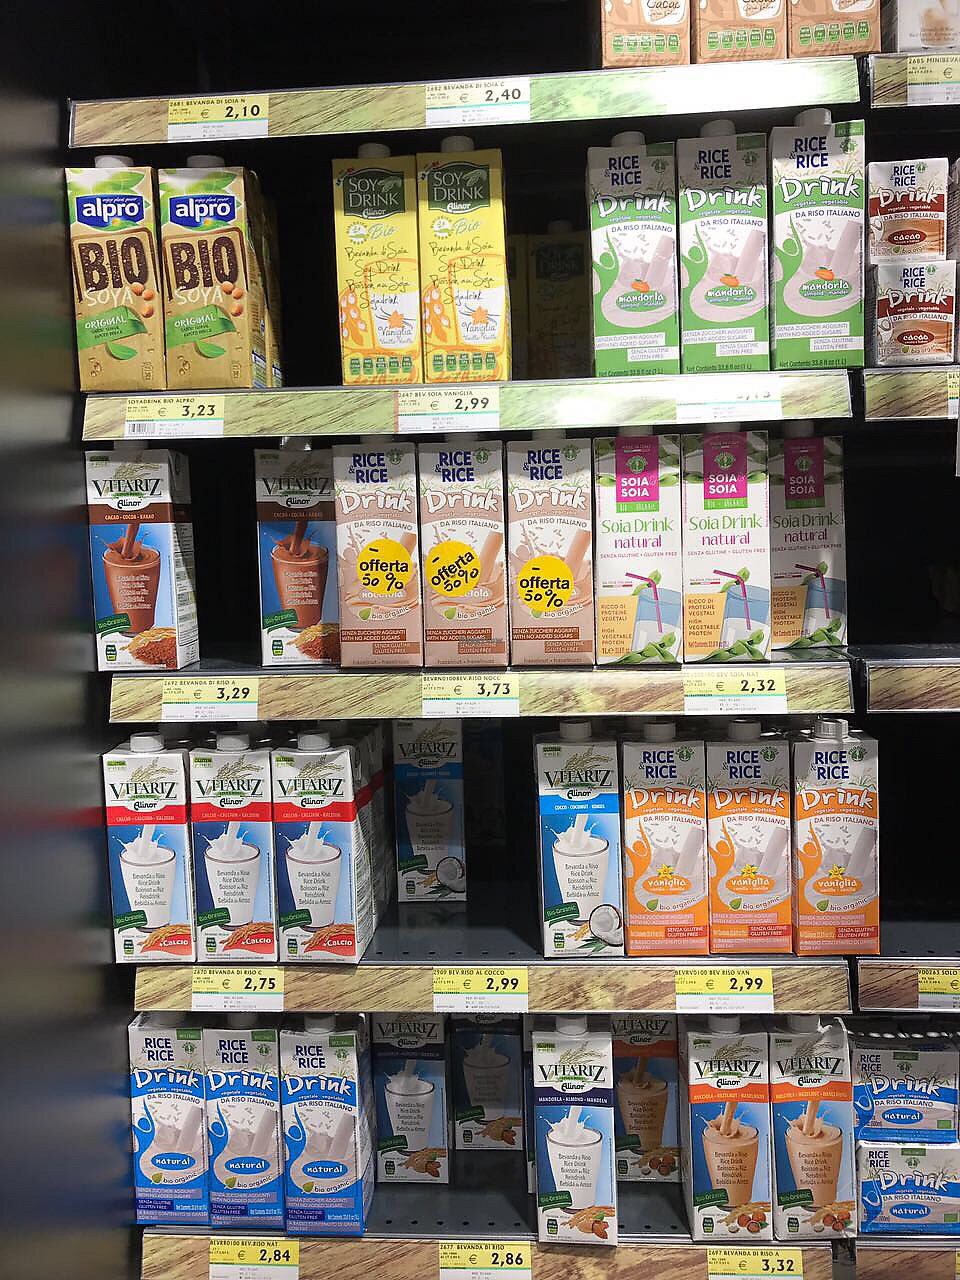 "Photo of Meta Supermercato  by <a href=""/members/profile/PepaKovacs"">PepaKovacs</a> <br/>Vegan Milks <br/> August 18, 2017  - <a href='/contact/abuse/image/97022/294022'>Report</a>"